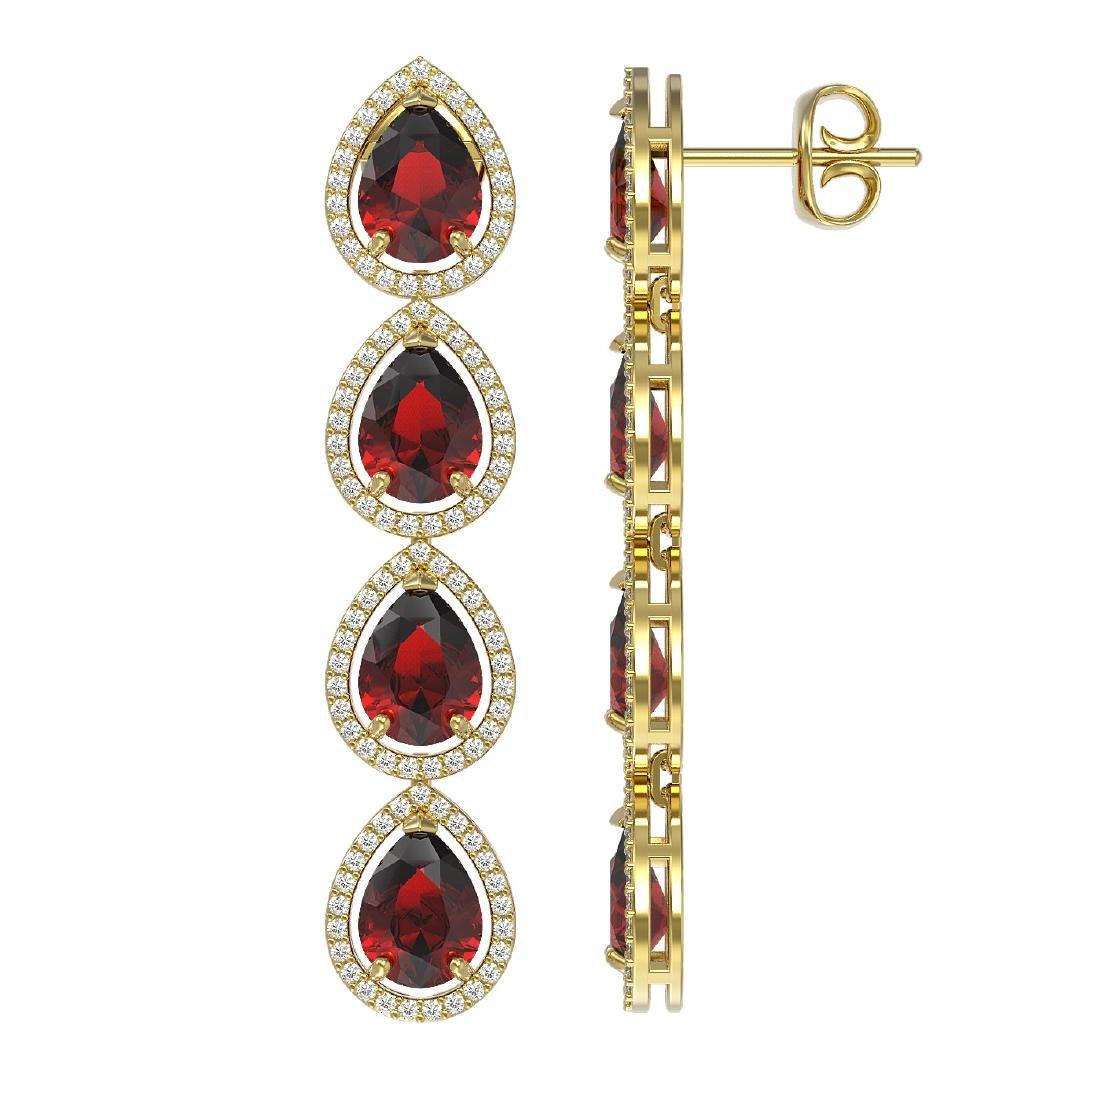 9.25 CTW Garnet & Diamond Halo Earrings 10K Yellow Gold - 2